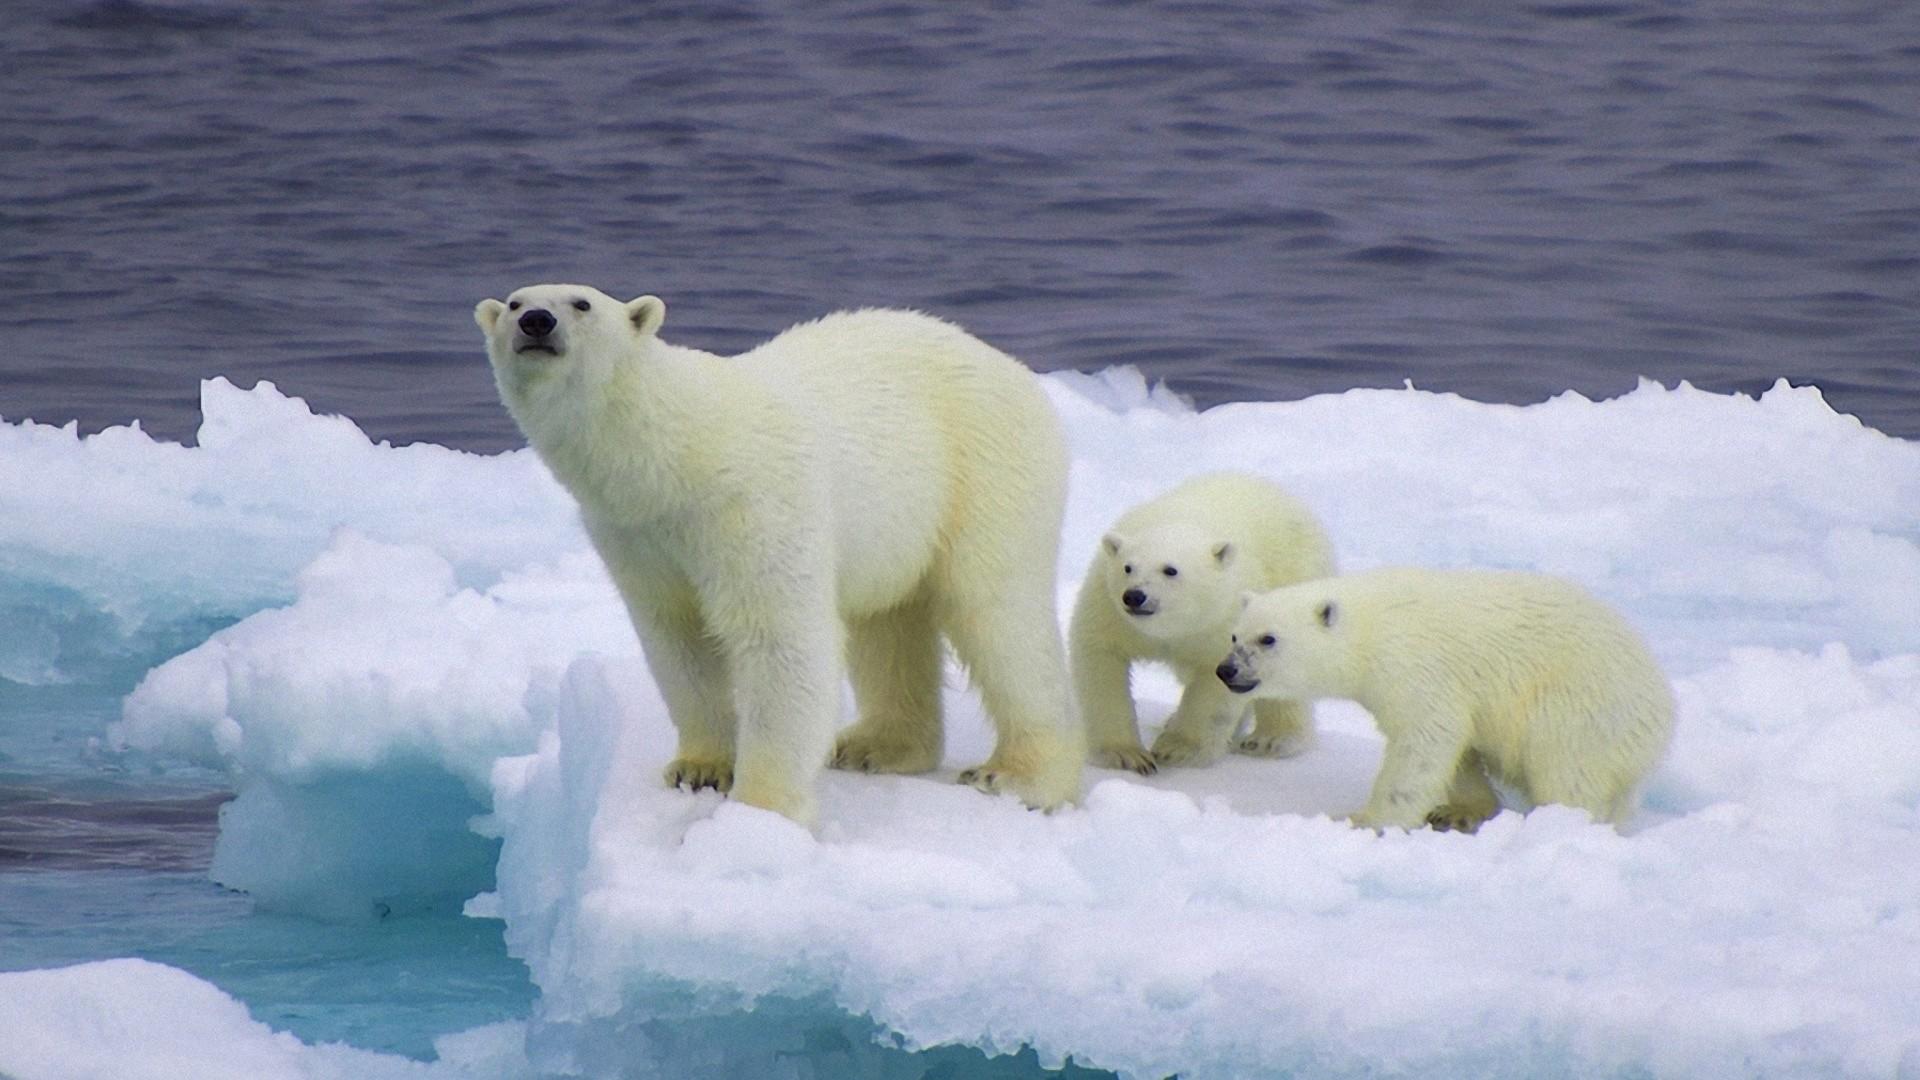 And Cubs On Iceberg wallpaperwallpaper screensaver .